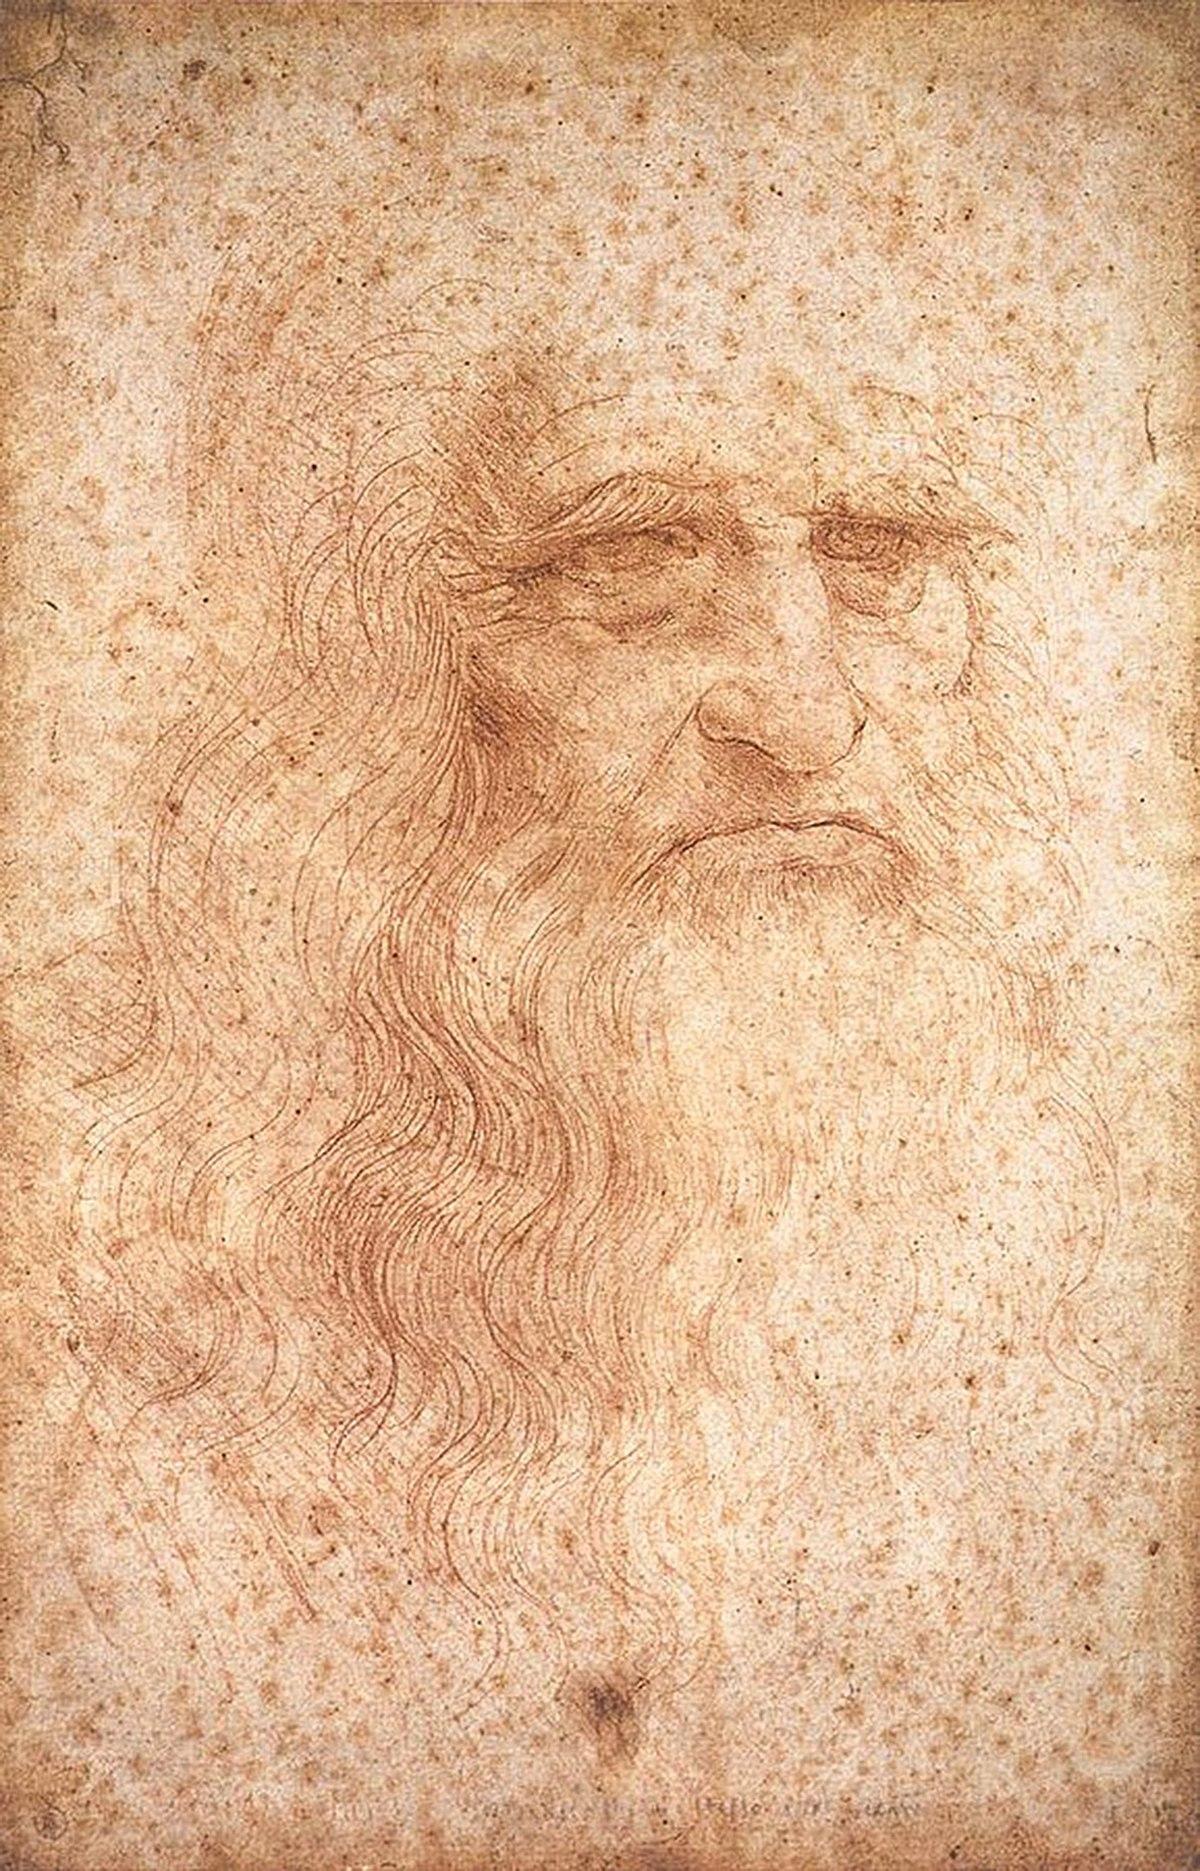 Leonardo Da Vinci Wikipedia La Enciclopedia Libre